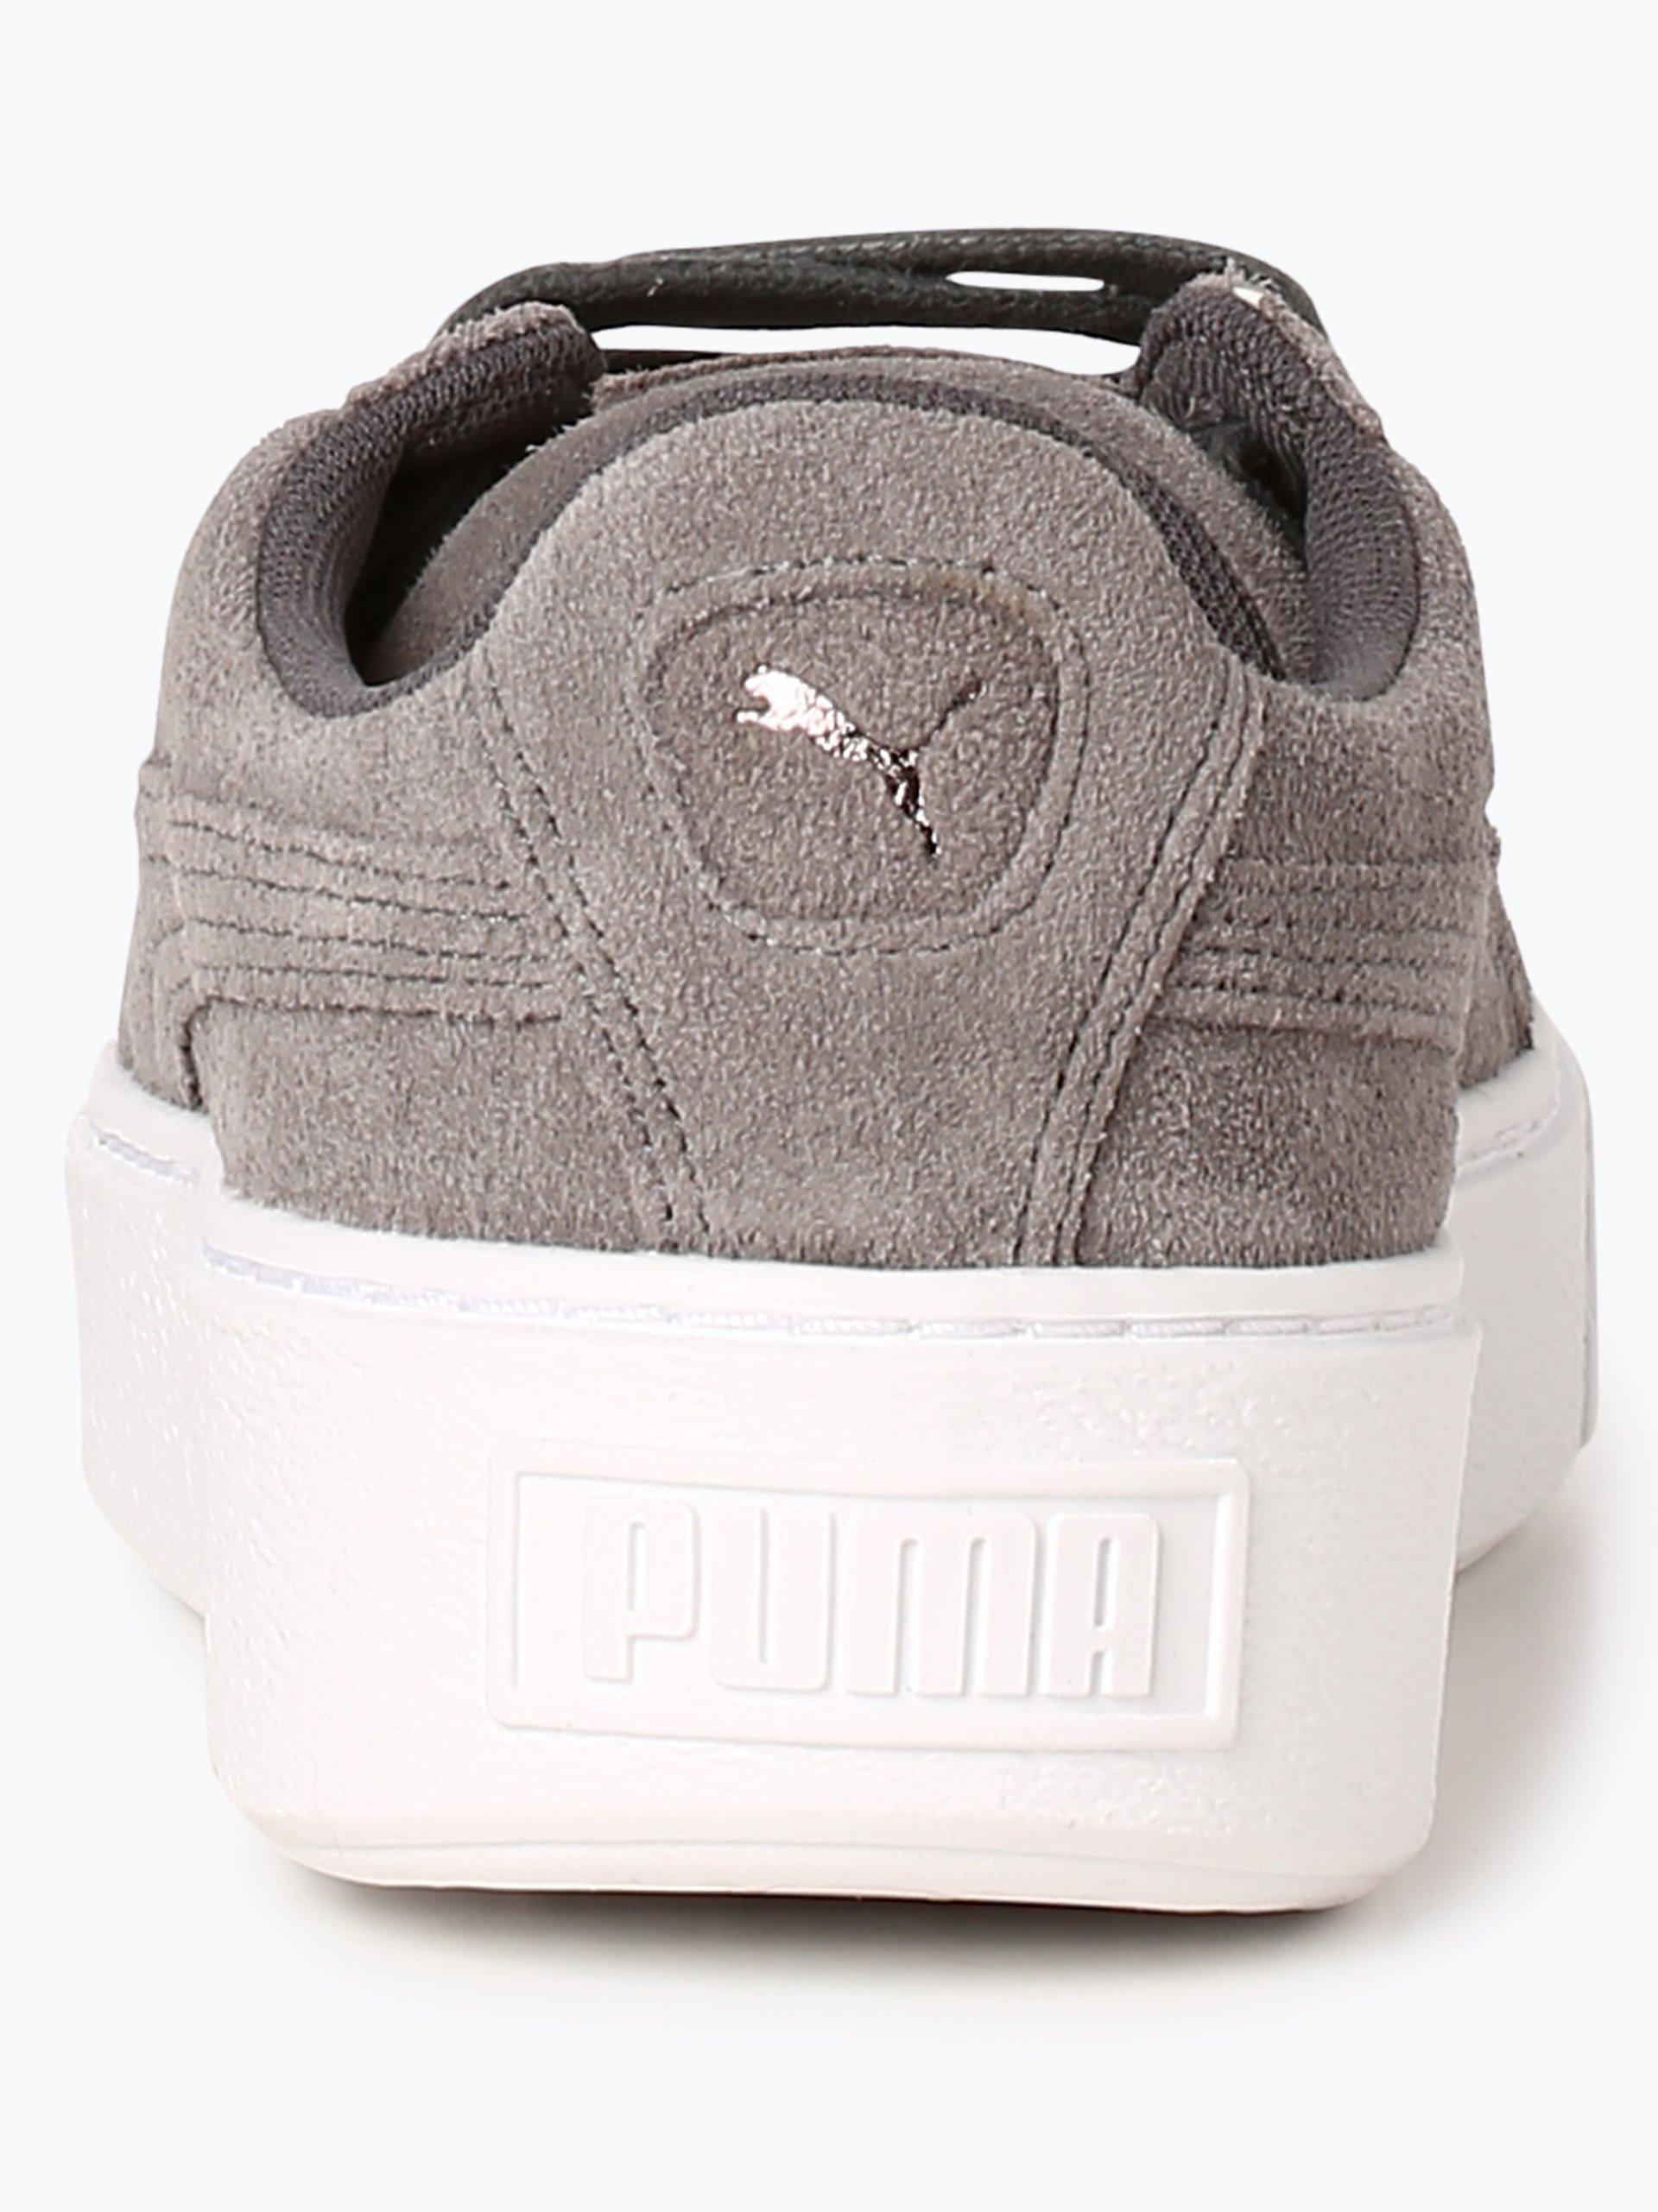 Puma Damen Sneaker aus Leder - Platform LunaLux